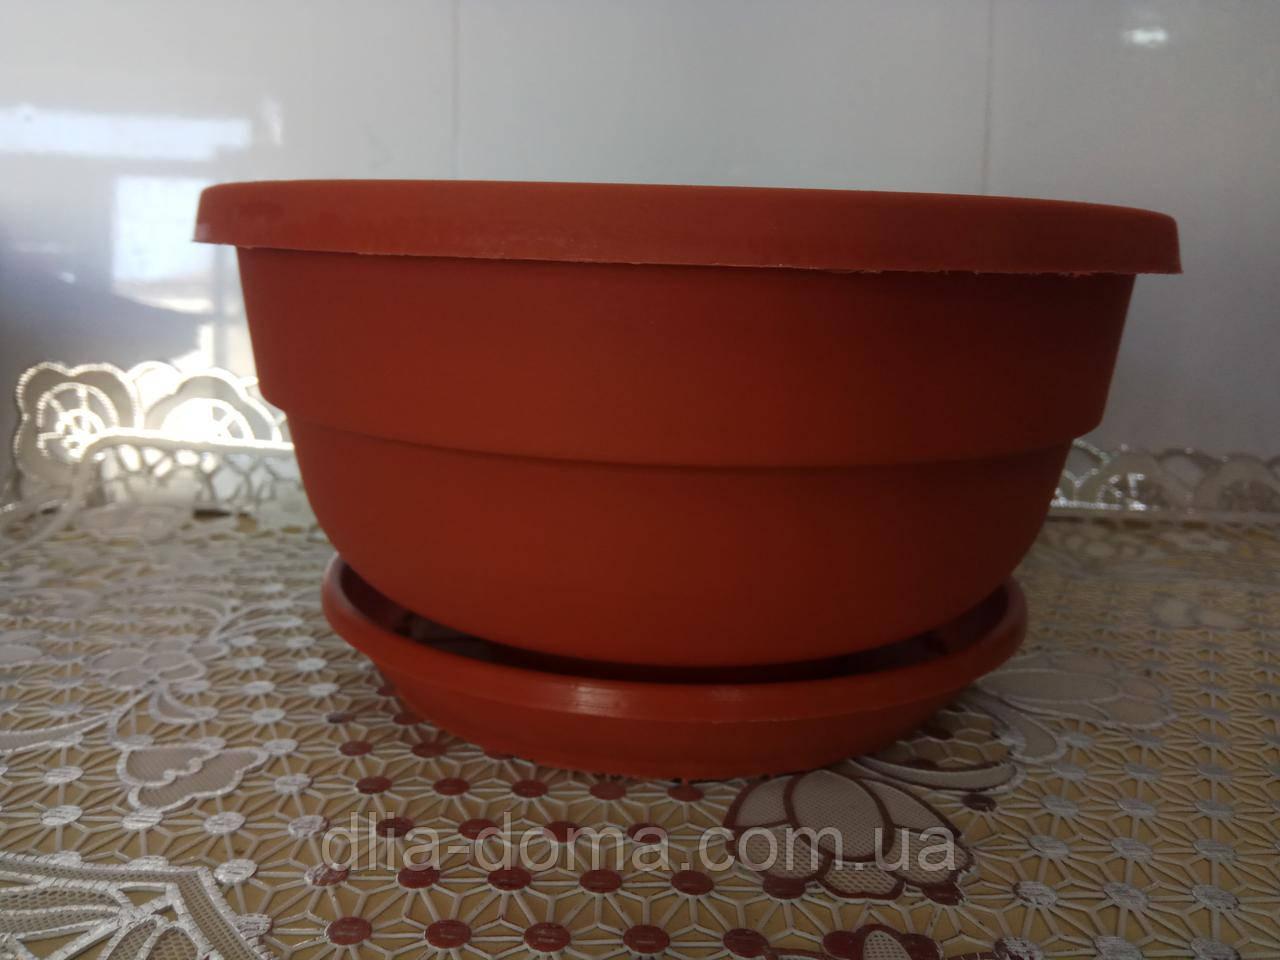 Горшок Фиалка диаметр 145 мм